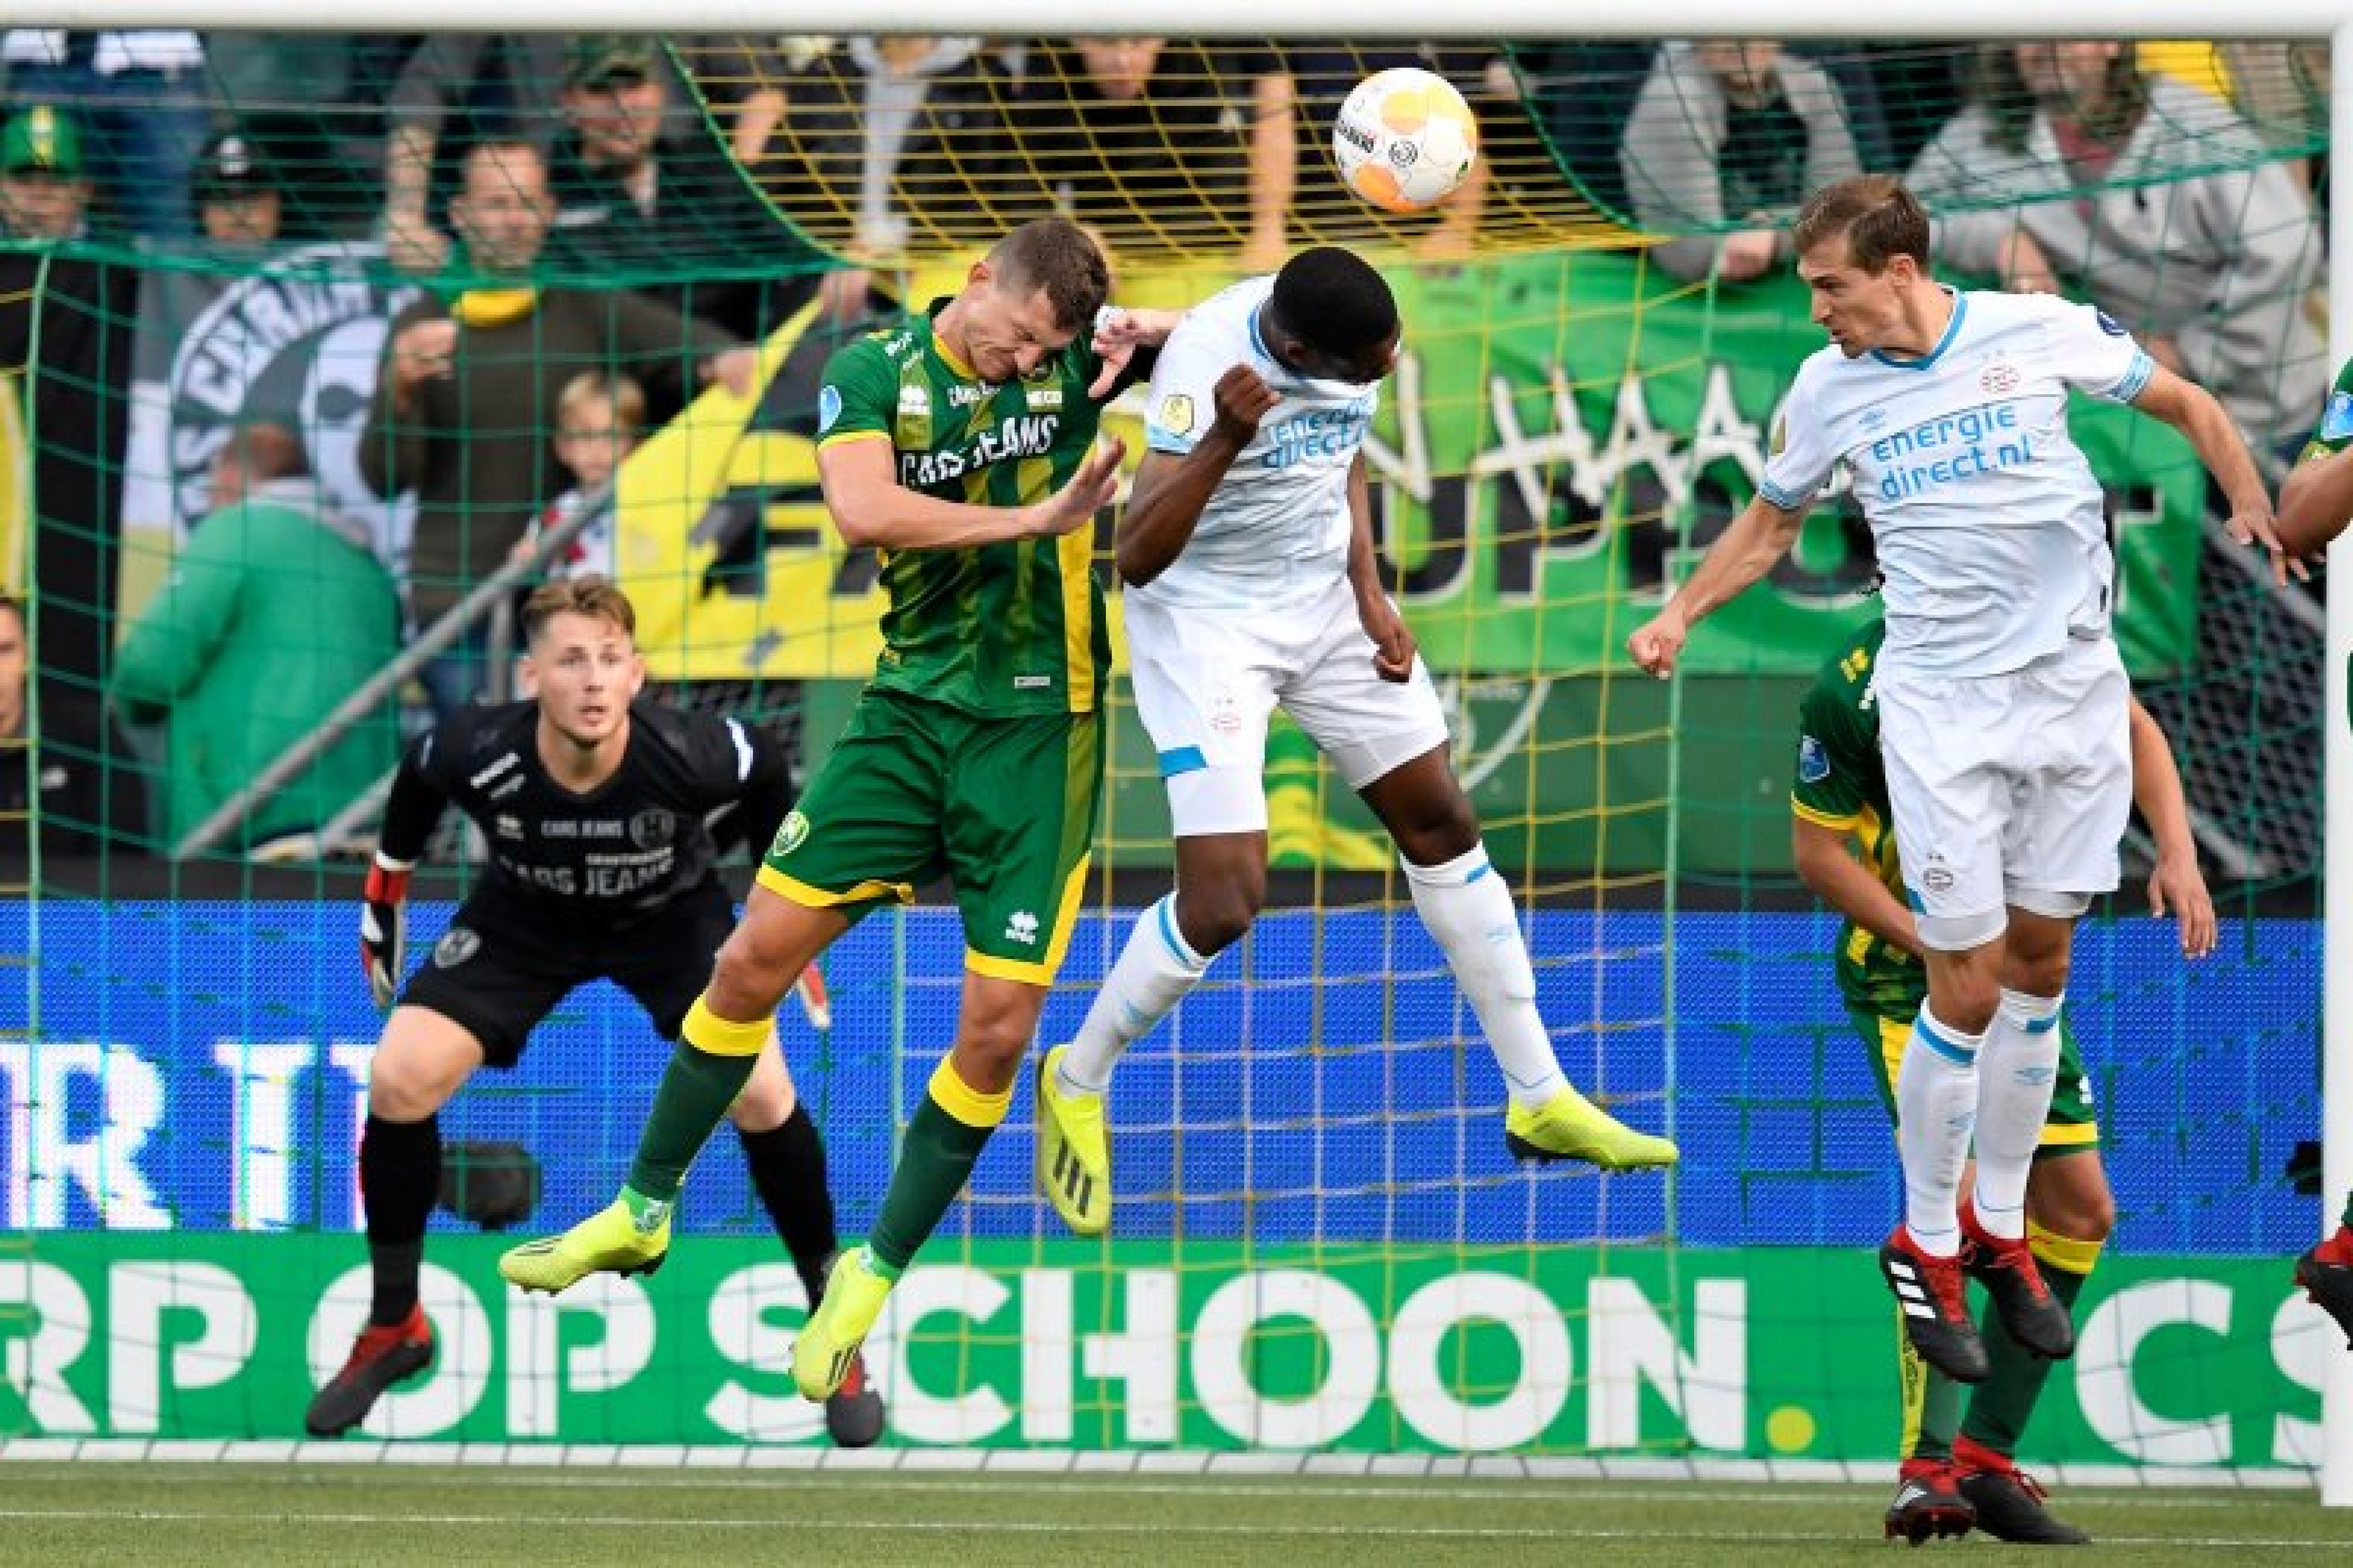 Eredivisie: PSV ed Ajax staccano le inseguitrici, male Zwolle e Groningen